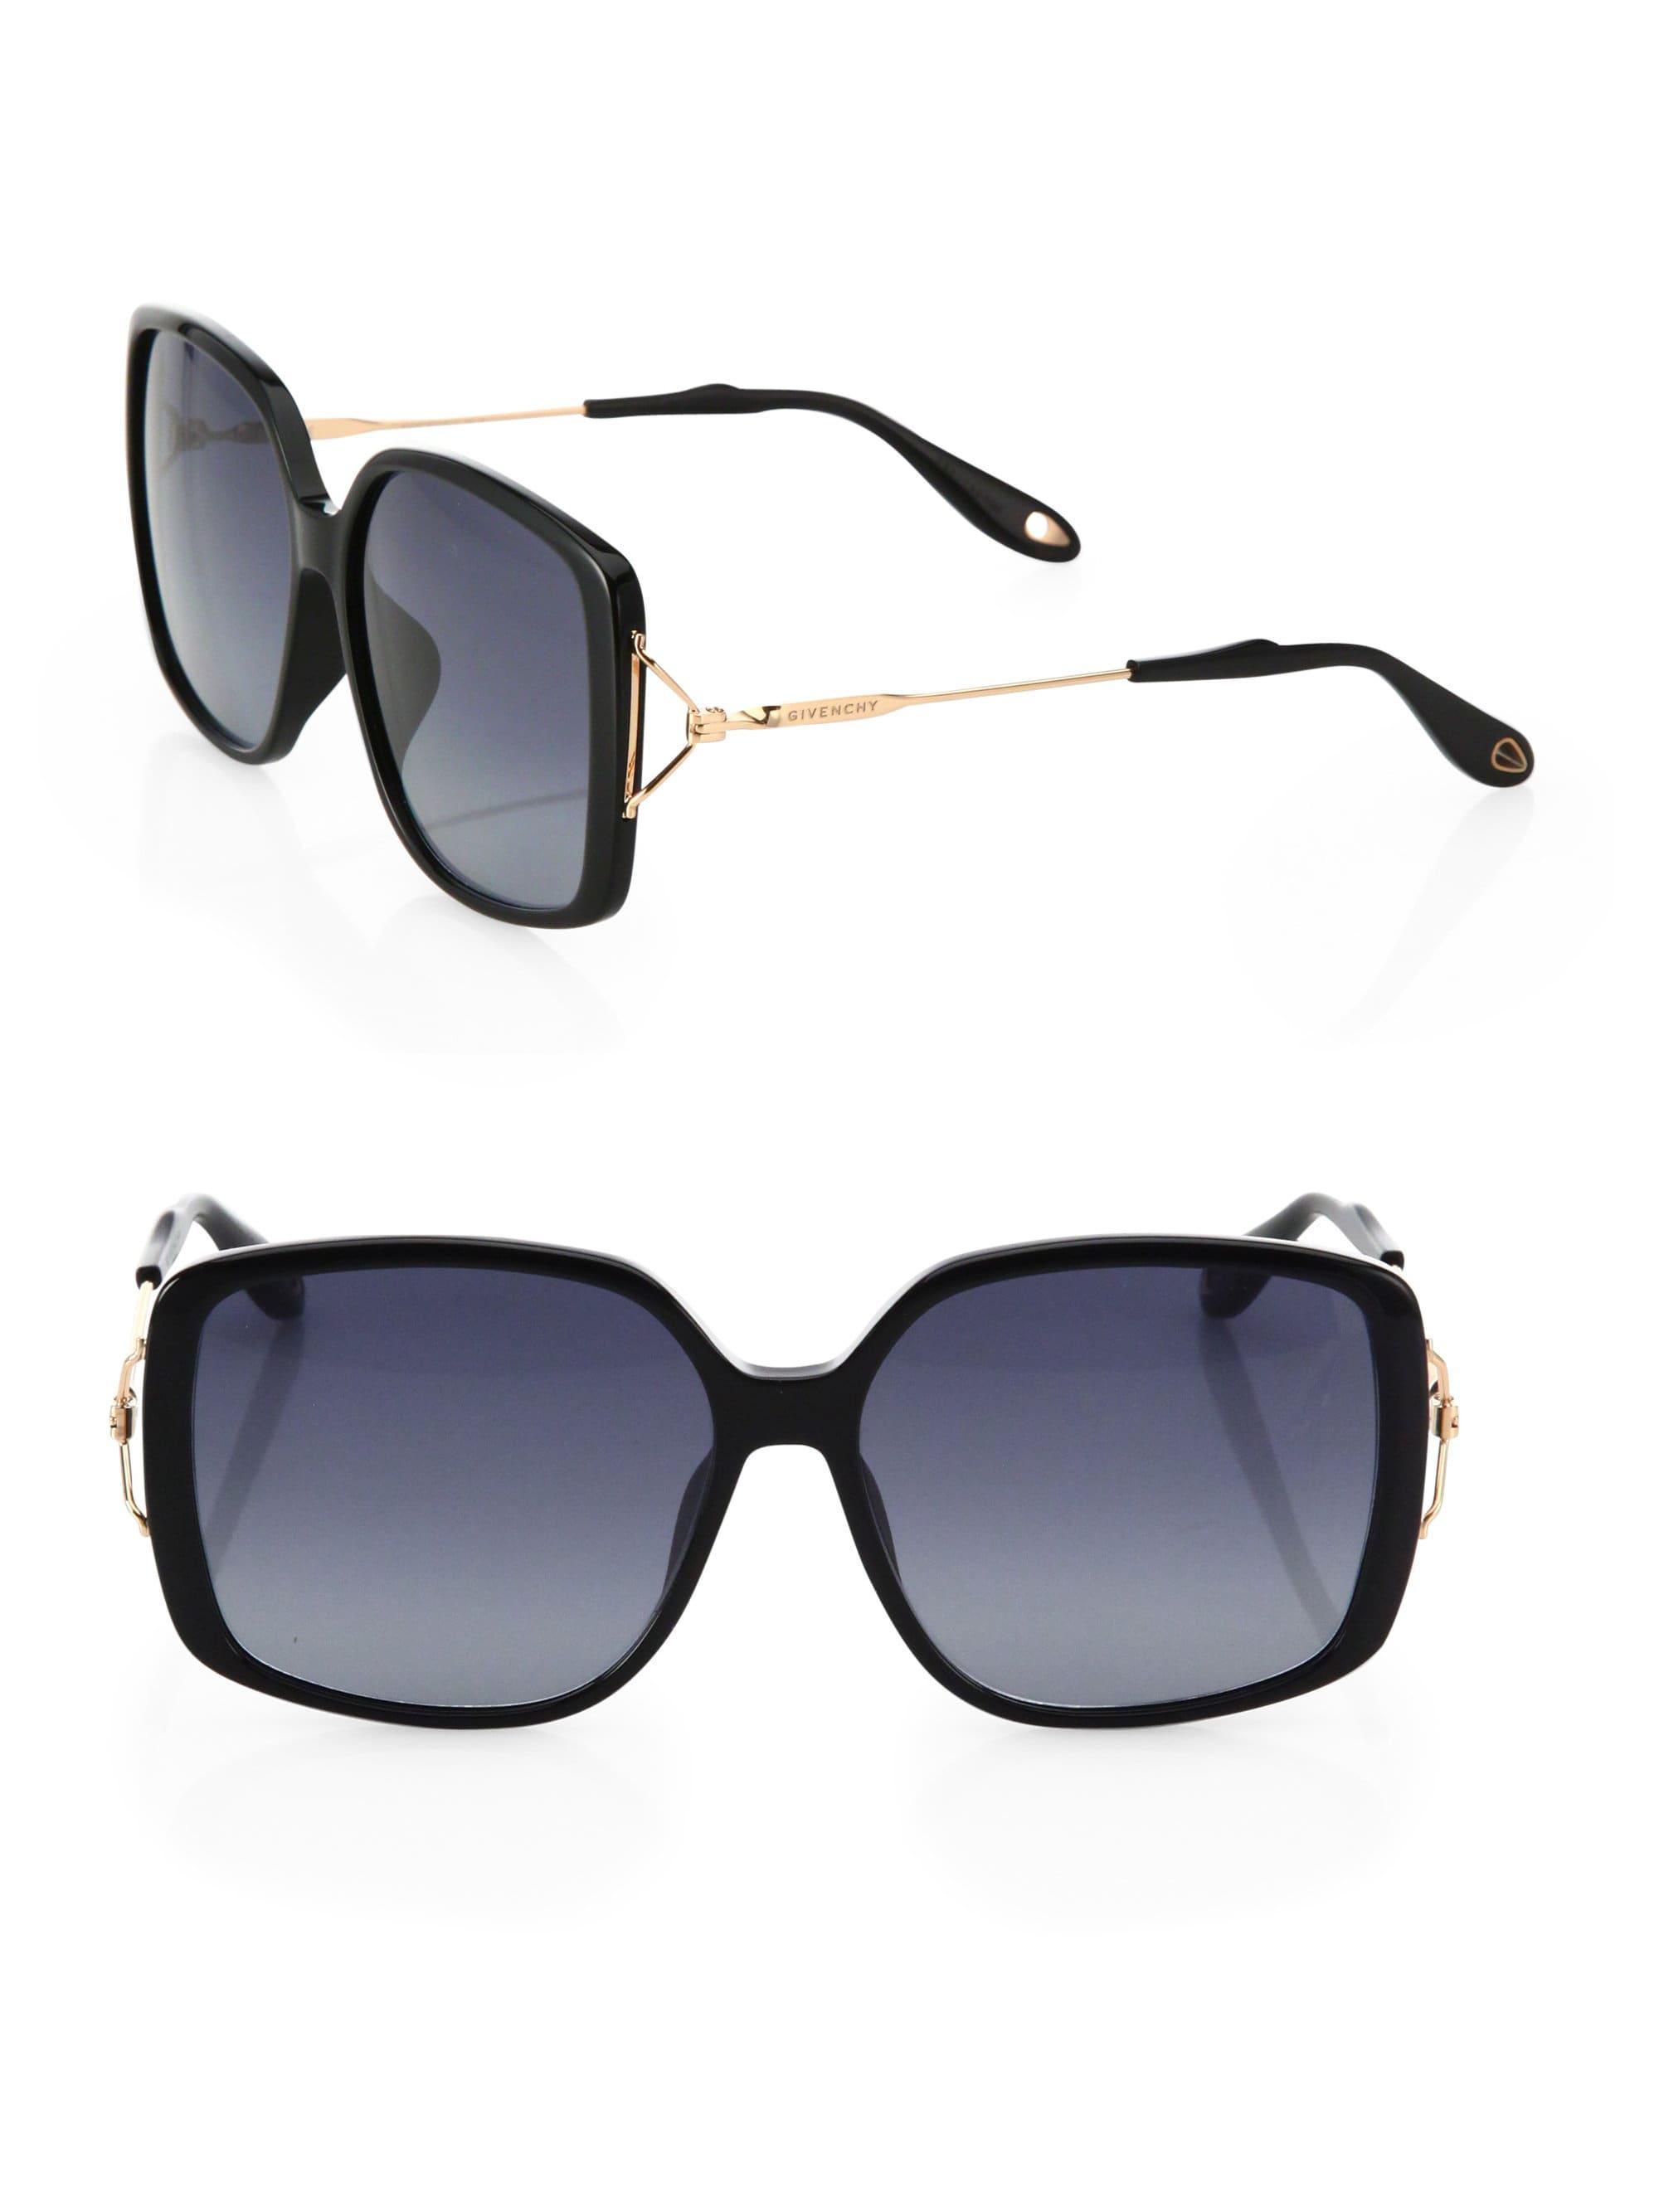 7cb3e2ebf88 Lyst - Givenchy Women s 58mm Oversized Square Sunglasses - Black ...